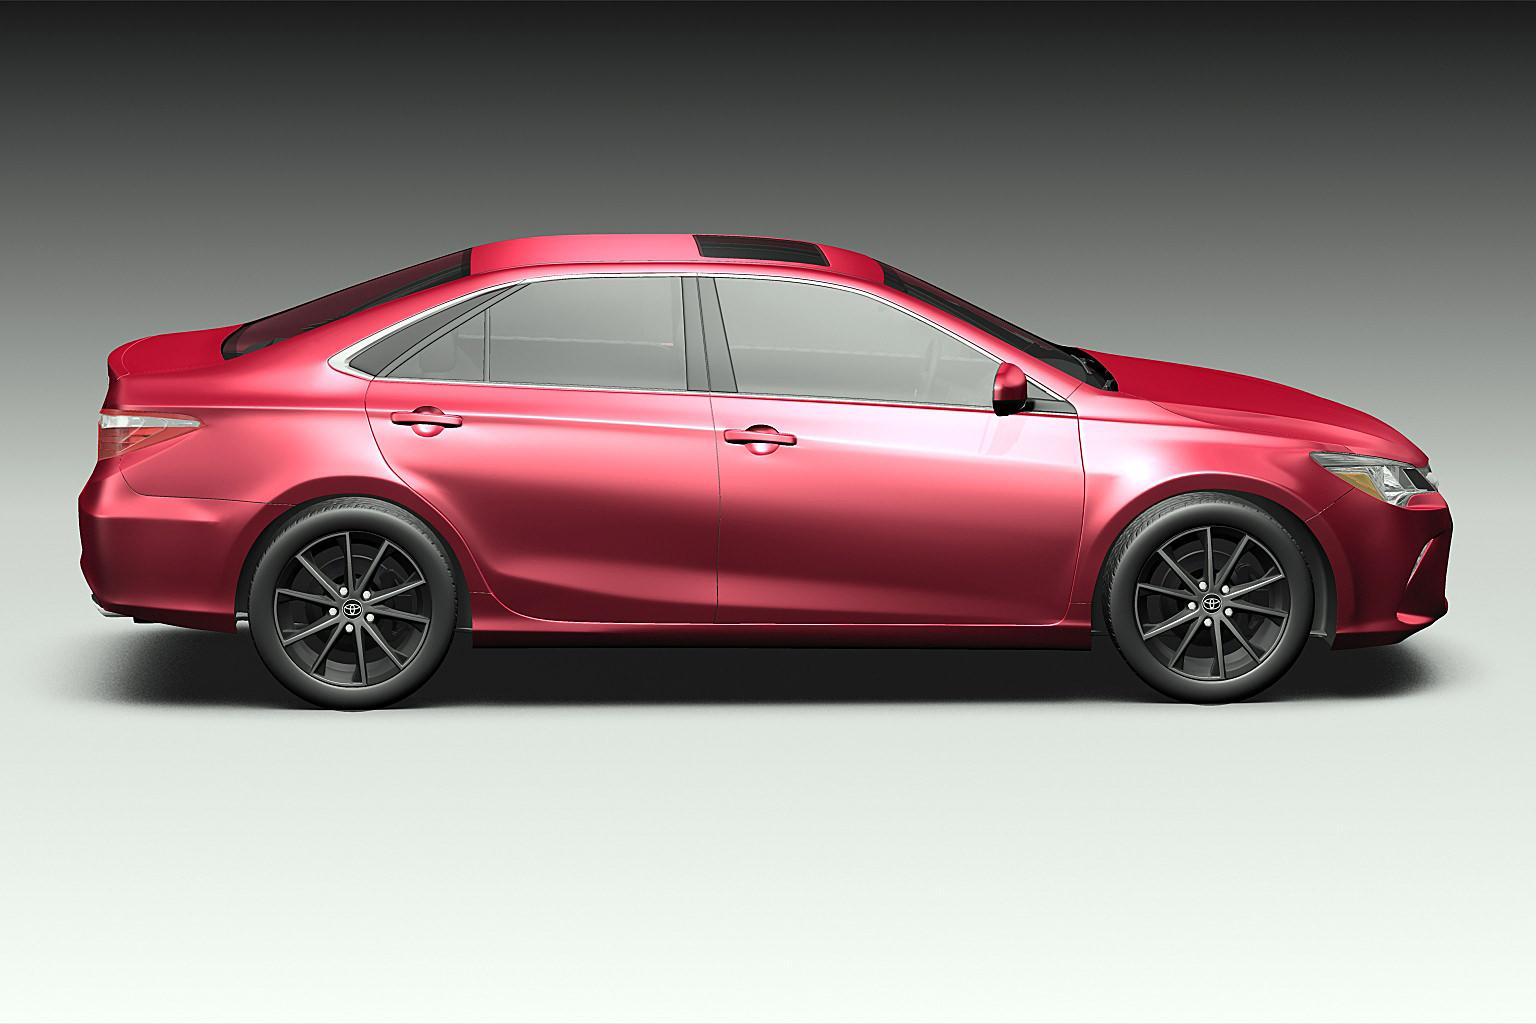 2015 Toyota Camry 3D Model MAX OBJ 3DS FBX C4D LWO LW LWS